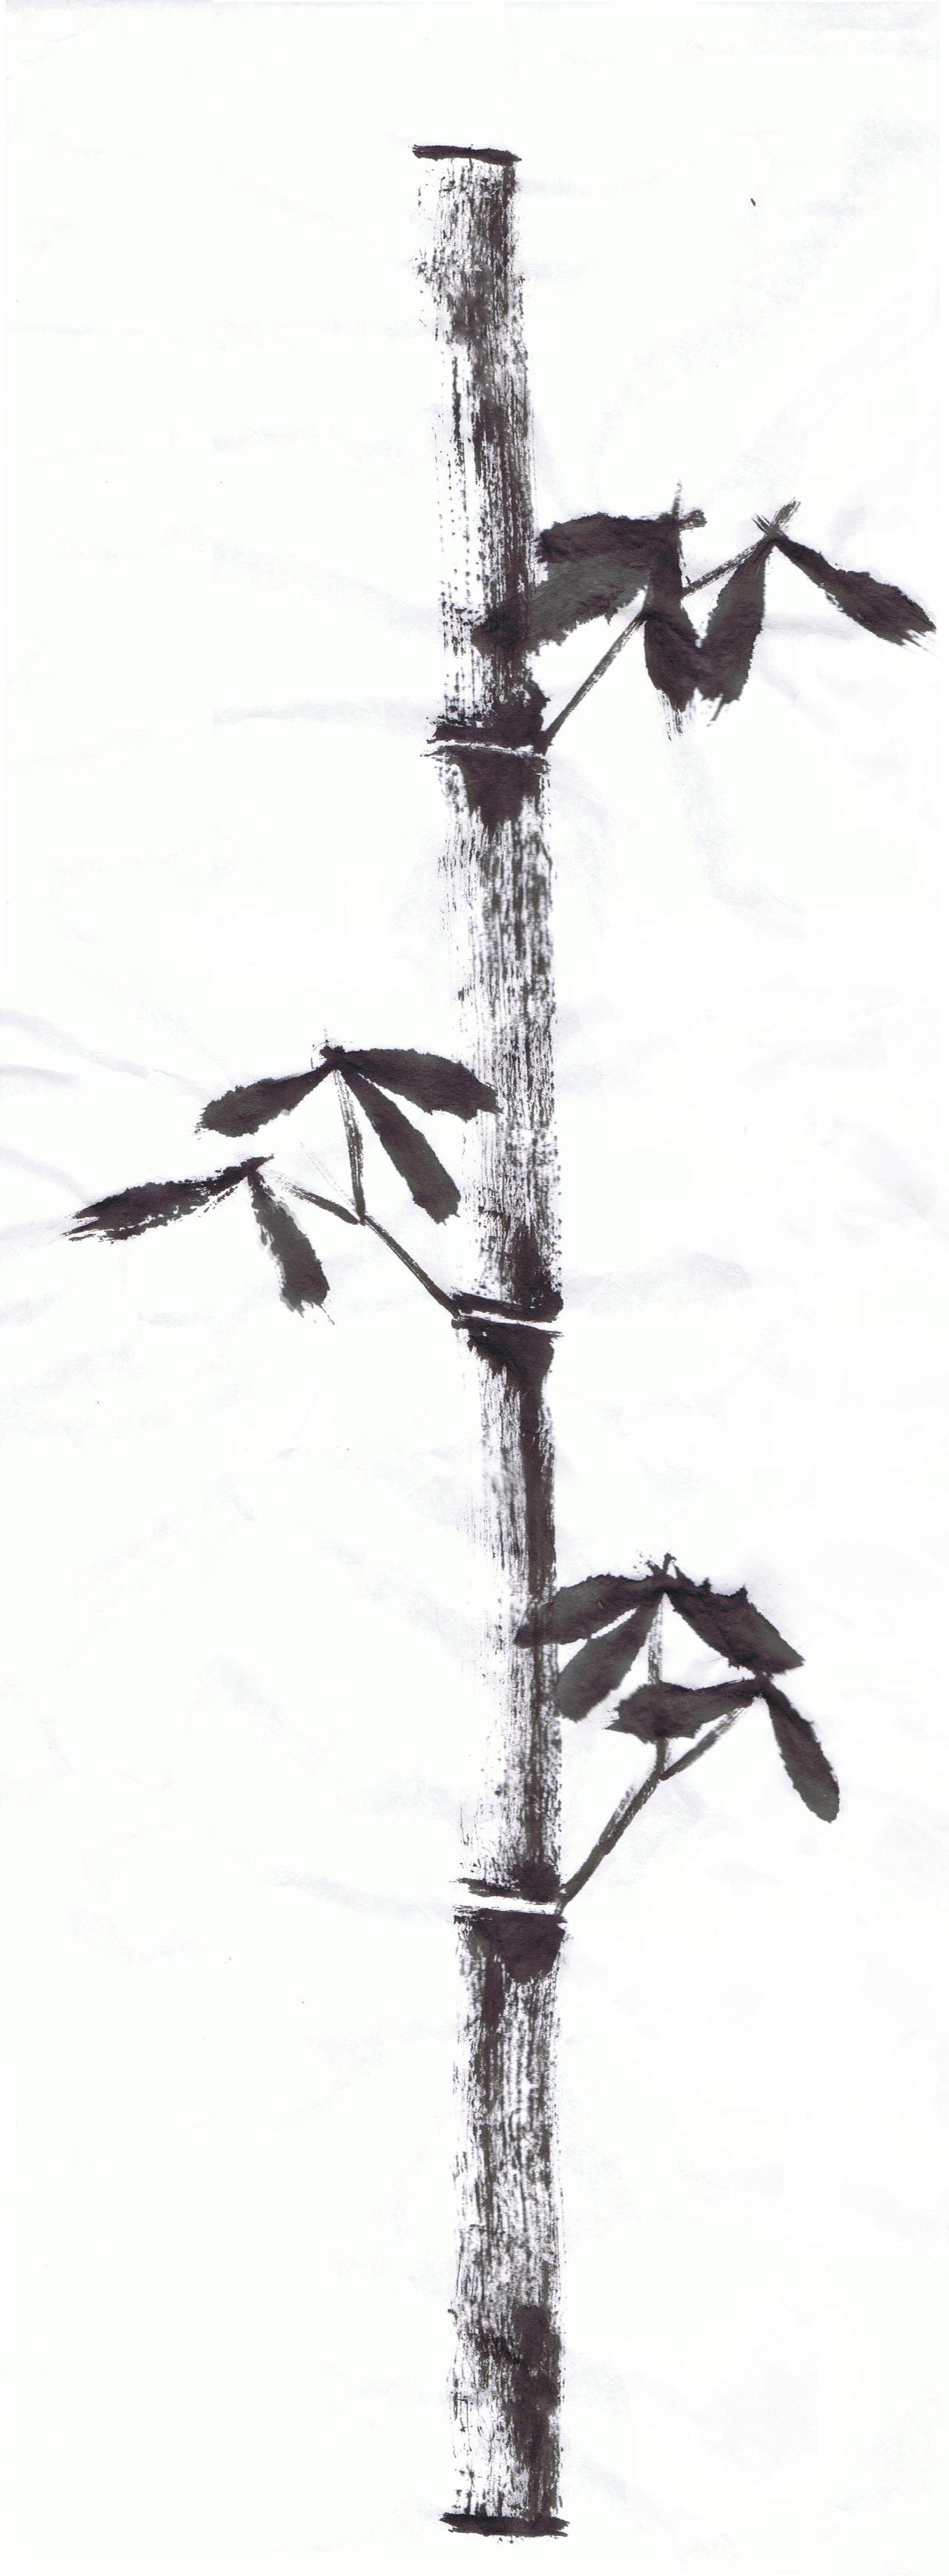 Bamboo Sumi-e by Sondsara